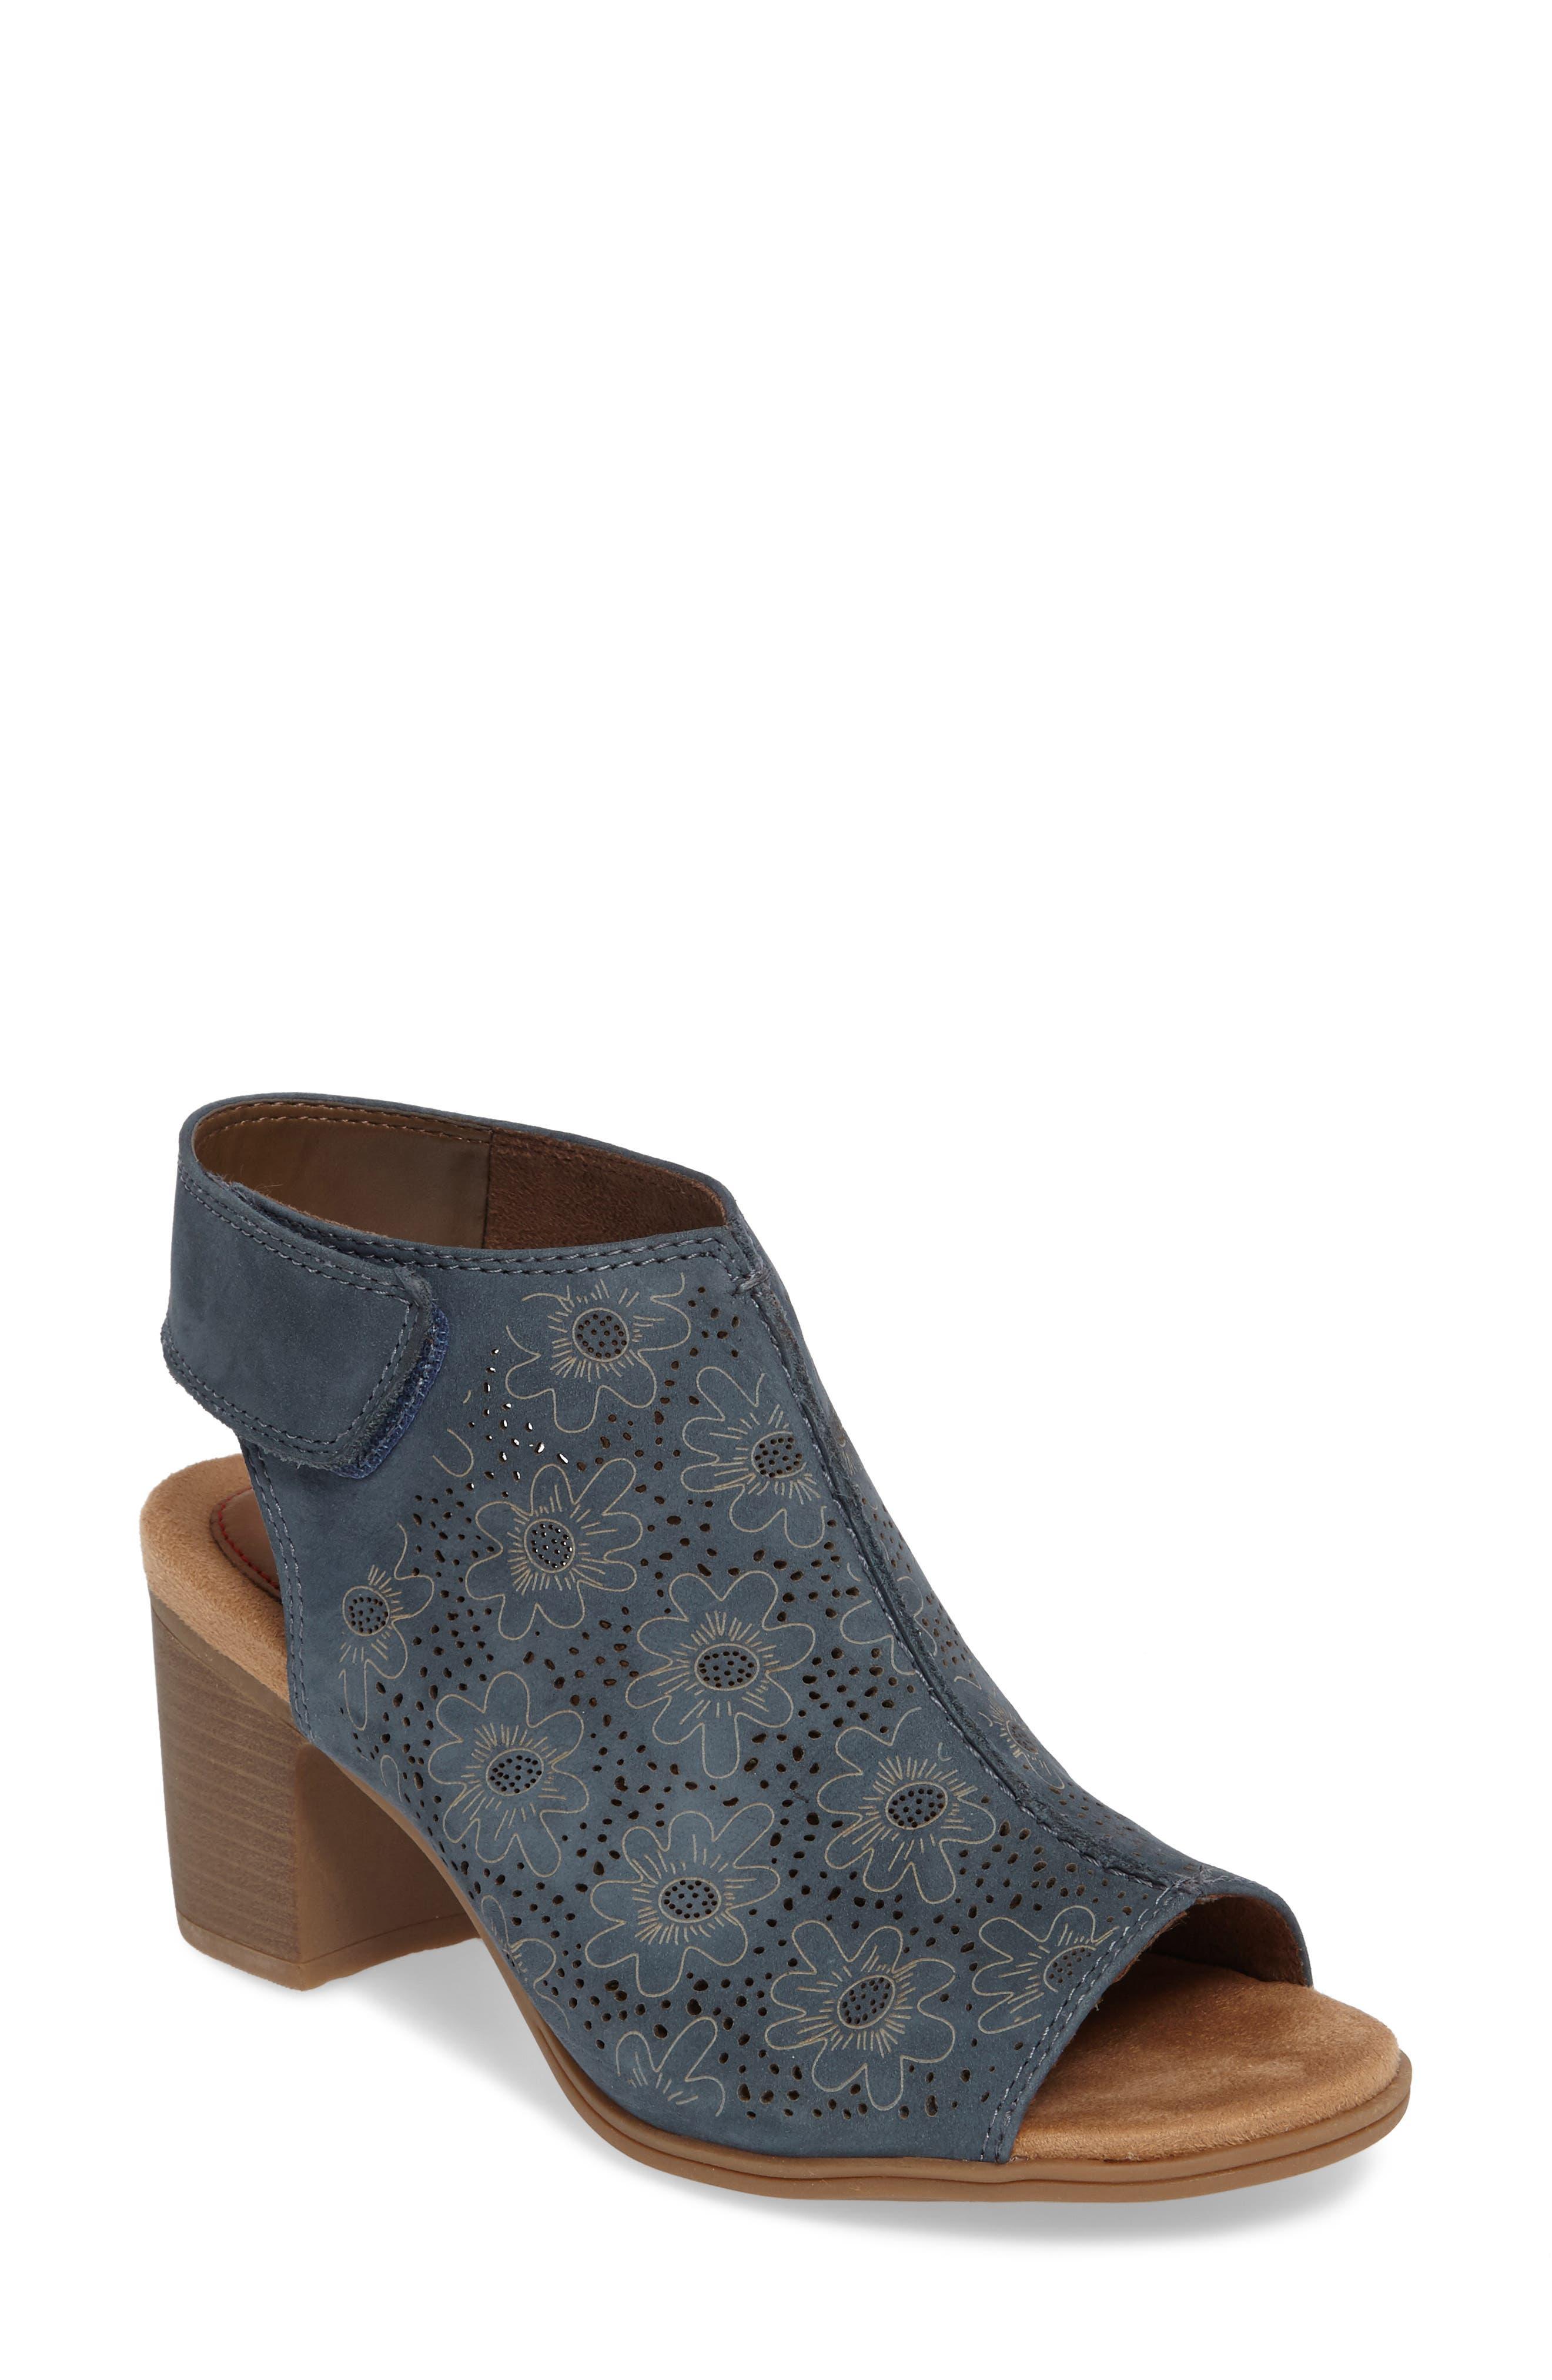 Alternate Image 1 Selected - Rockport Cobb Hill Hattie Perforated Slingback Sandal (Women)